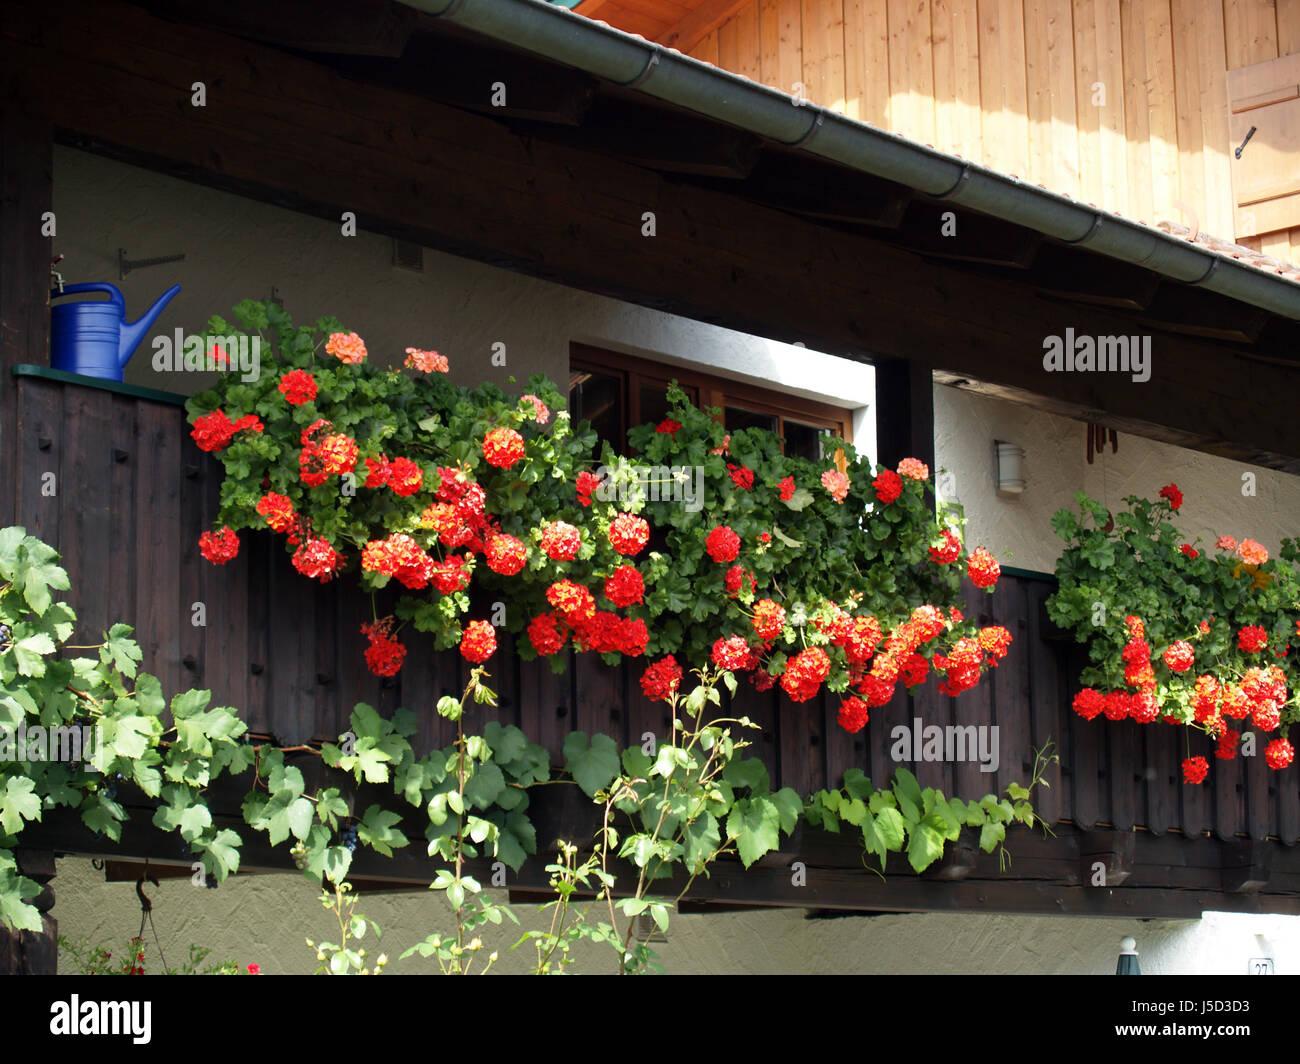 geraniums balcony bayern stockfotos geraniums balcony bayern bilder alamy. Black Bedroom Furniture Sets. Home Design Ideas